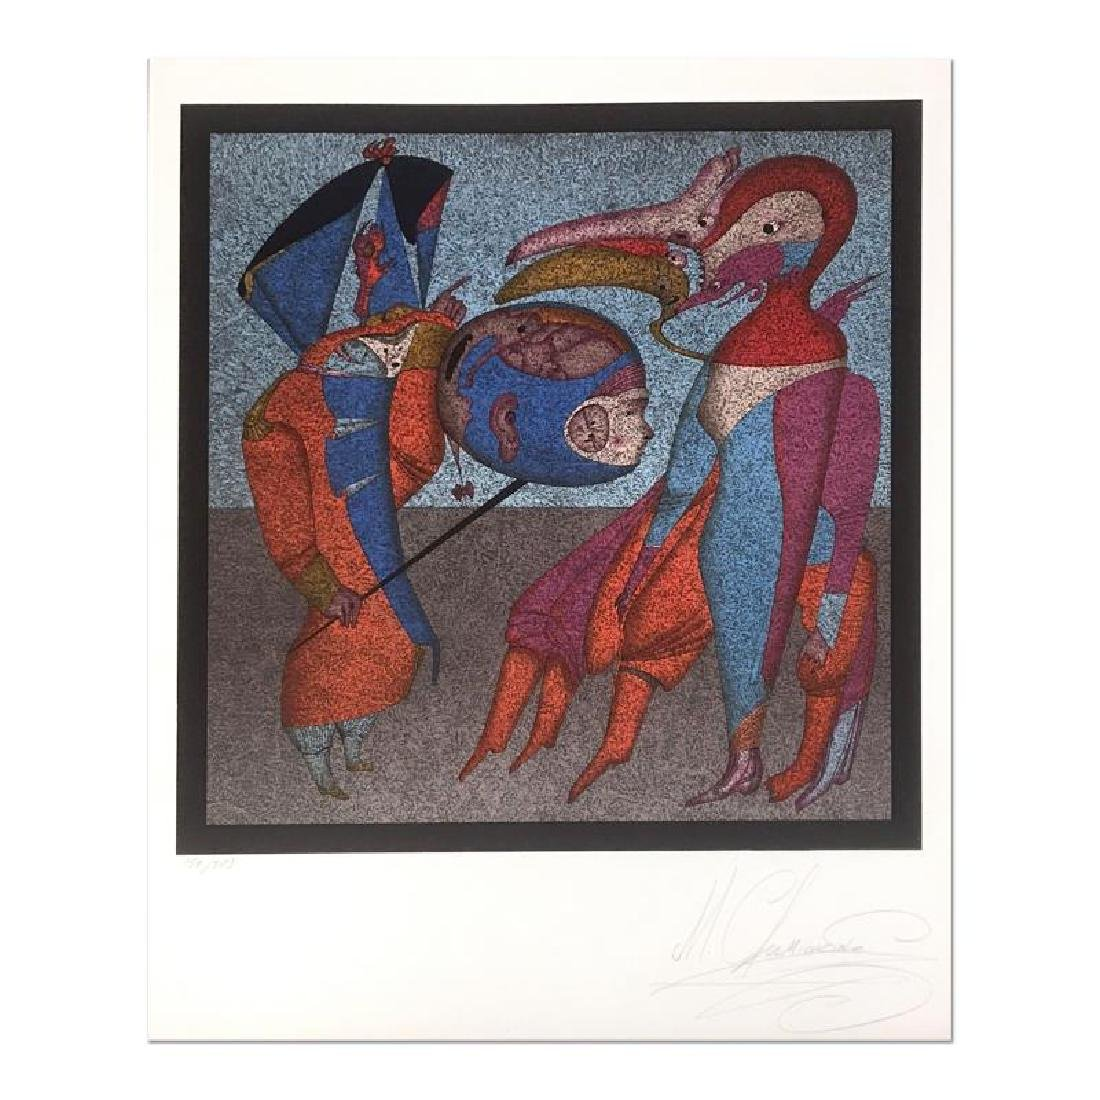 "Chemiakin, Mihail ""Carnival Series: Untitled 9"""